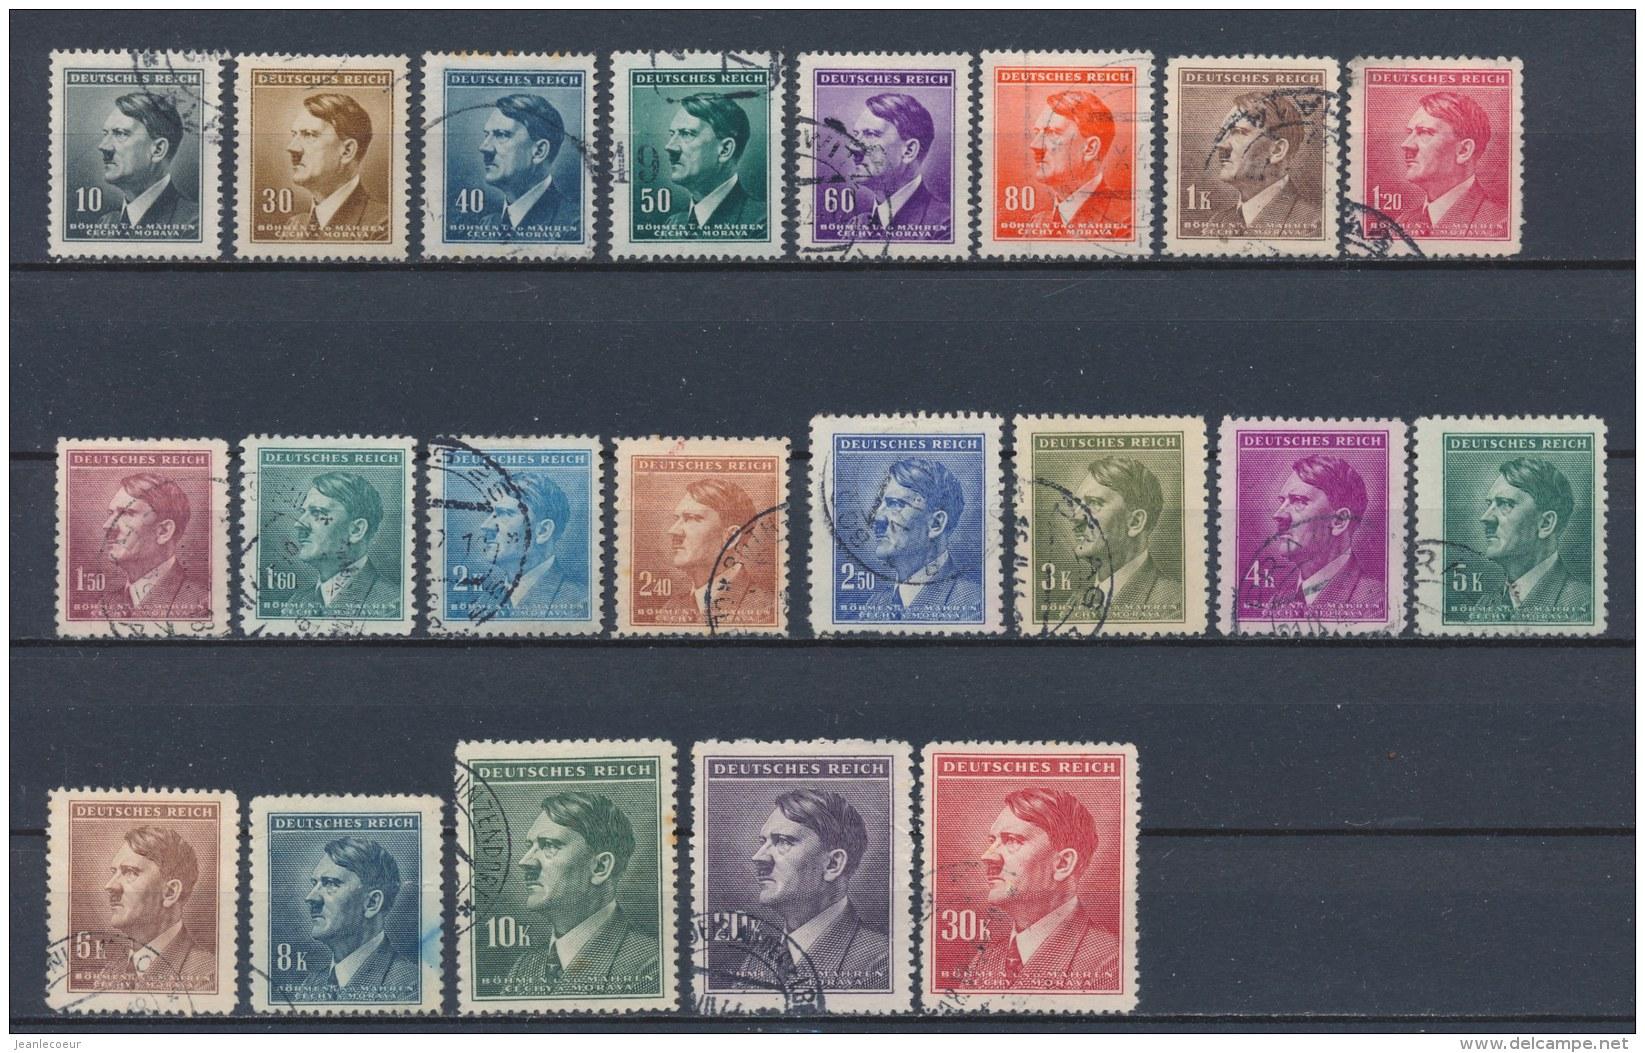 Böhmen Und Mähren/Bohemian & Moravia/Boheme & Moravie 1942 Mi: 89-109 Yt:  (Gebr/used/obl/o)(2029) - Used Stamps